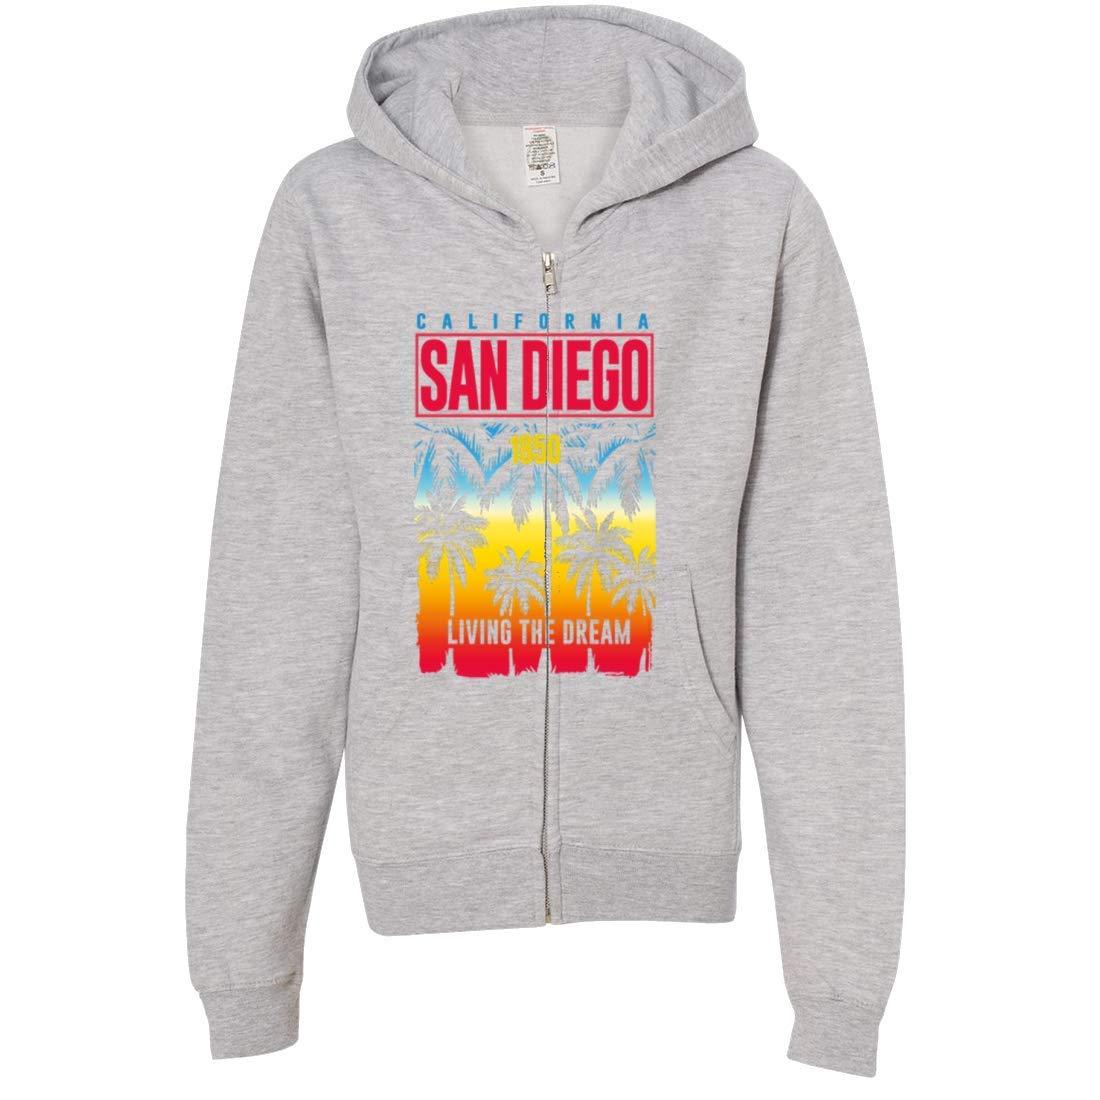 San Diego Living The Dream Premium Youth Zip-Up Hoodie